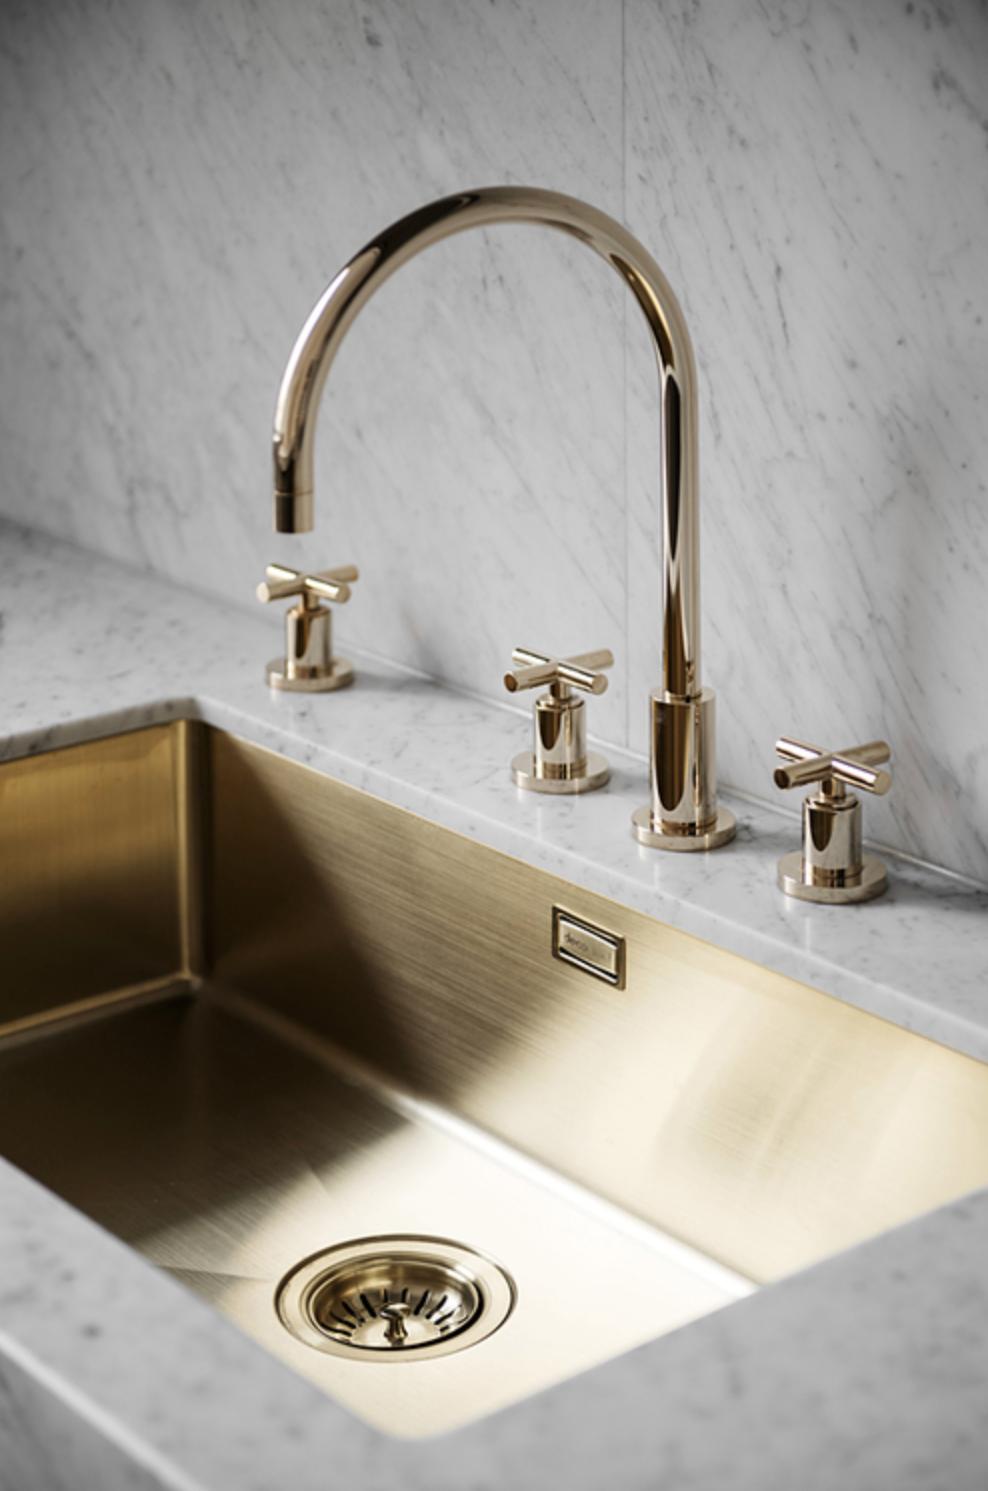 Perfectly minimal kitchen design - COCO LAPINE DESIGN